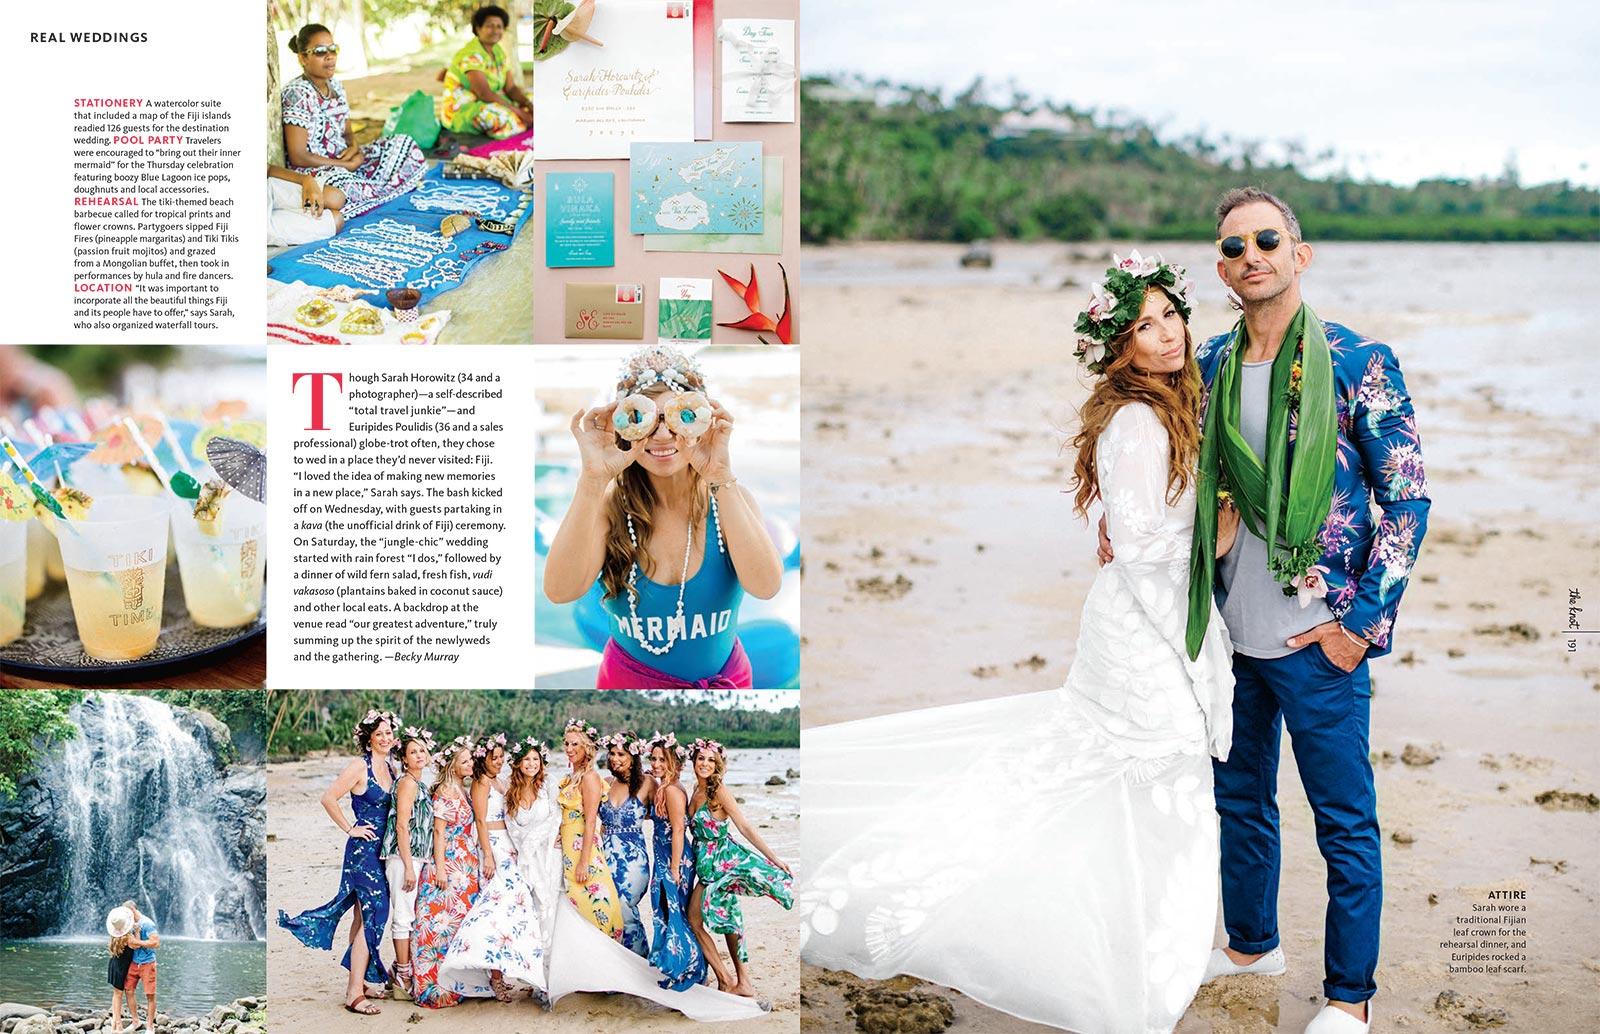 Fiji-Destination-Wedding-the-Knot2.jpg